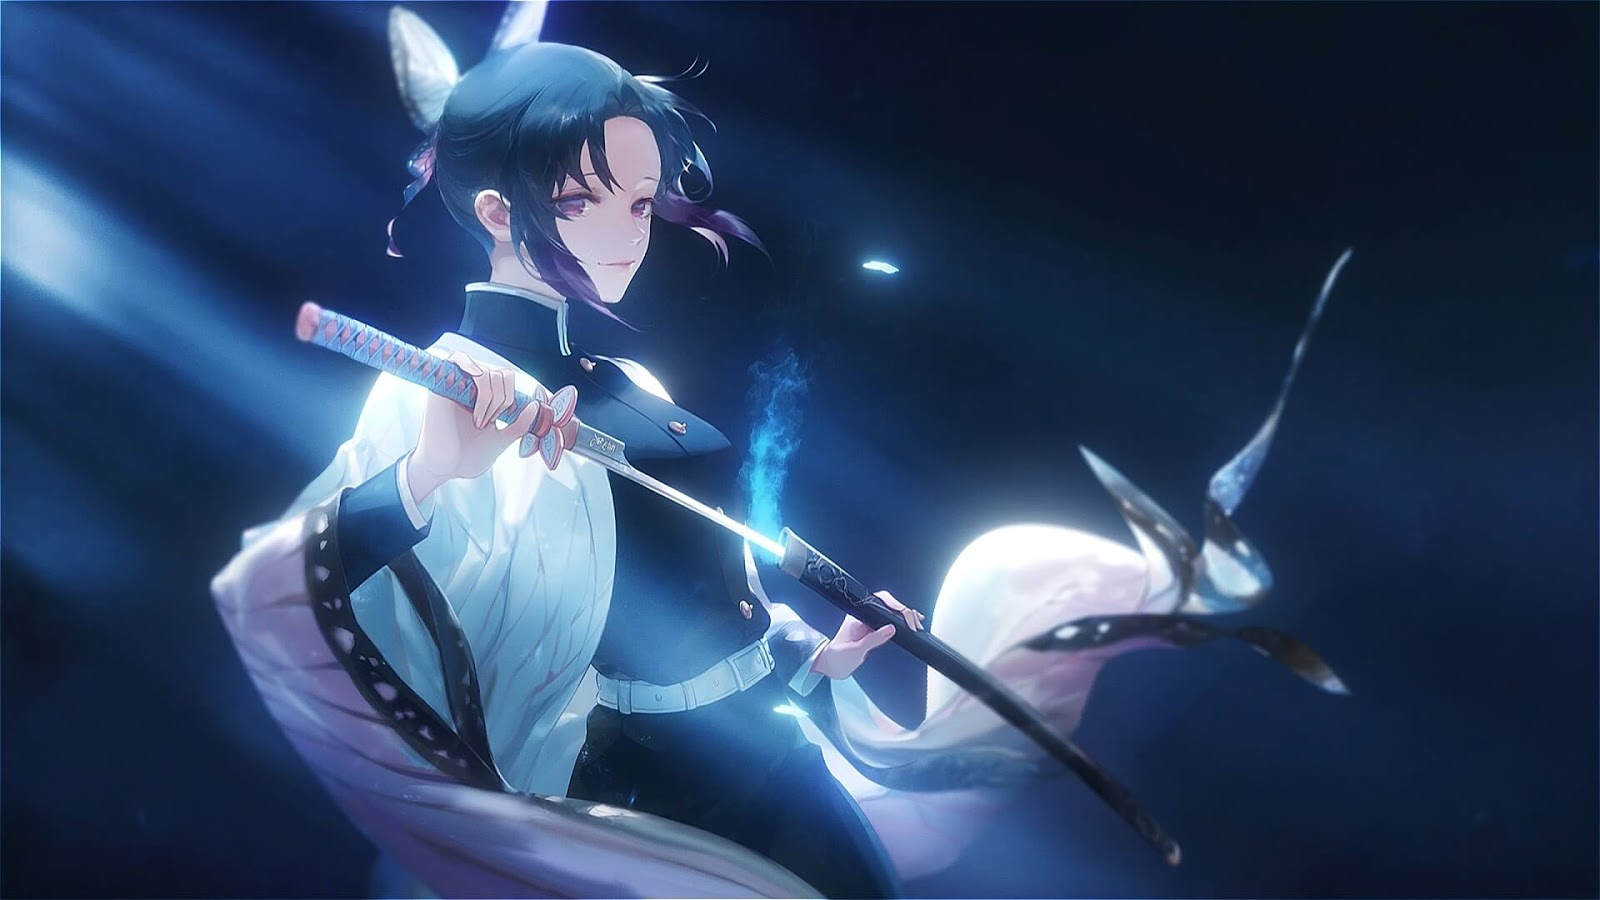 40 Gambar Wallpaper Anime Bergerak Pc Terbaru 2020 Miuiku